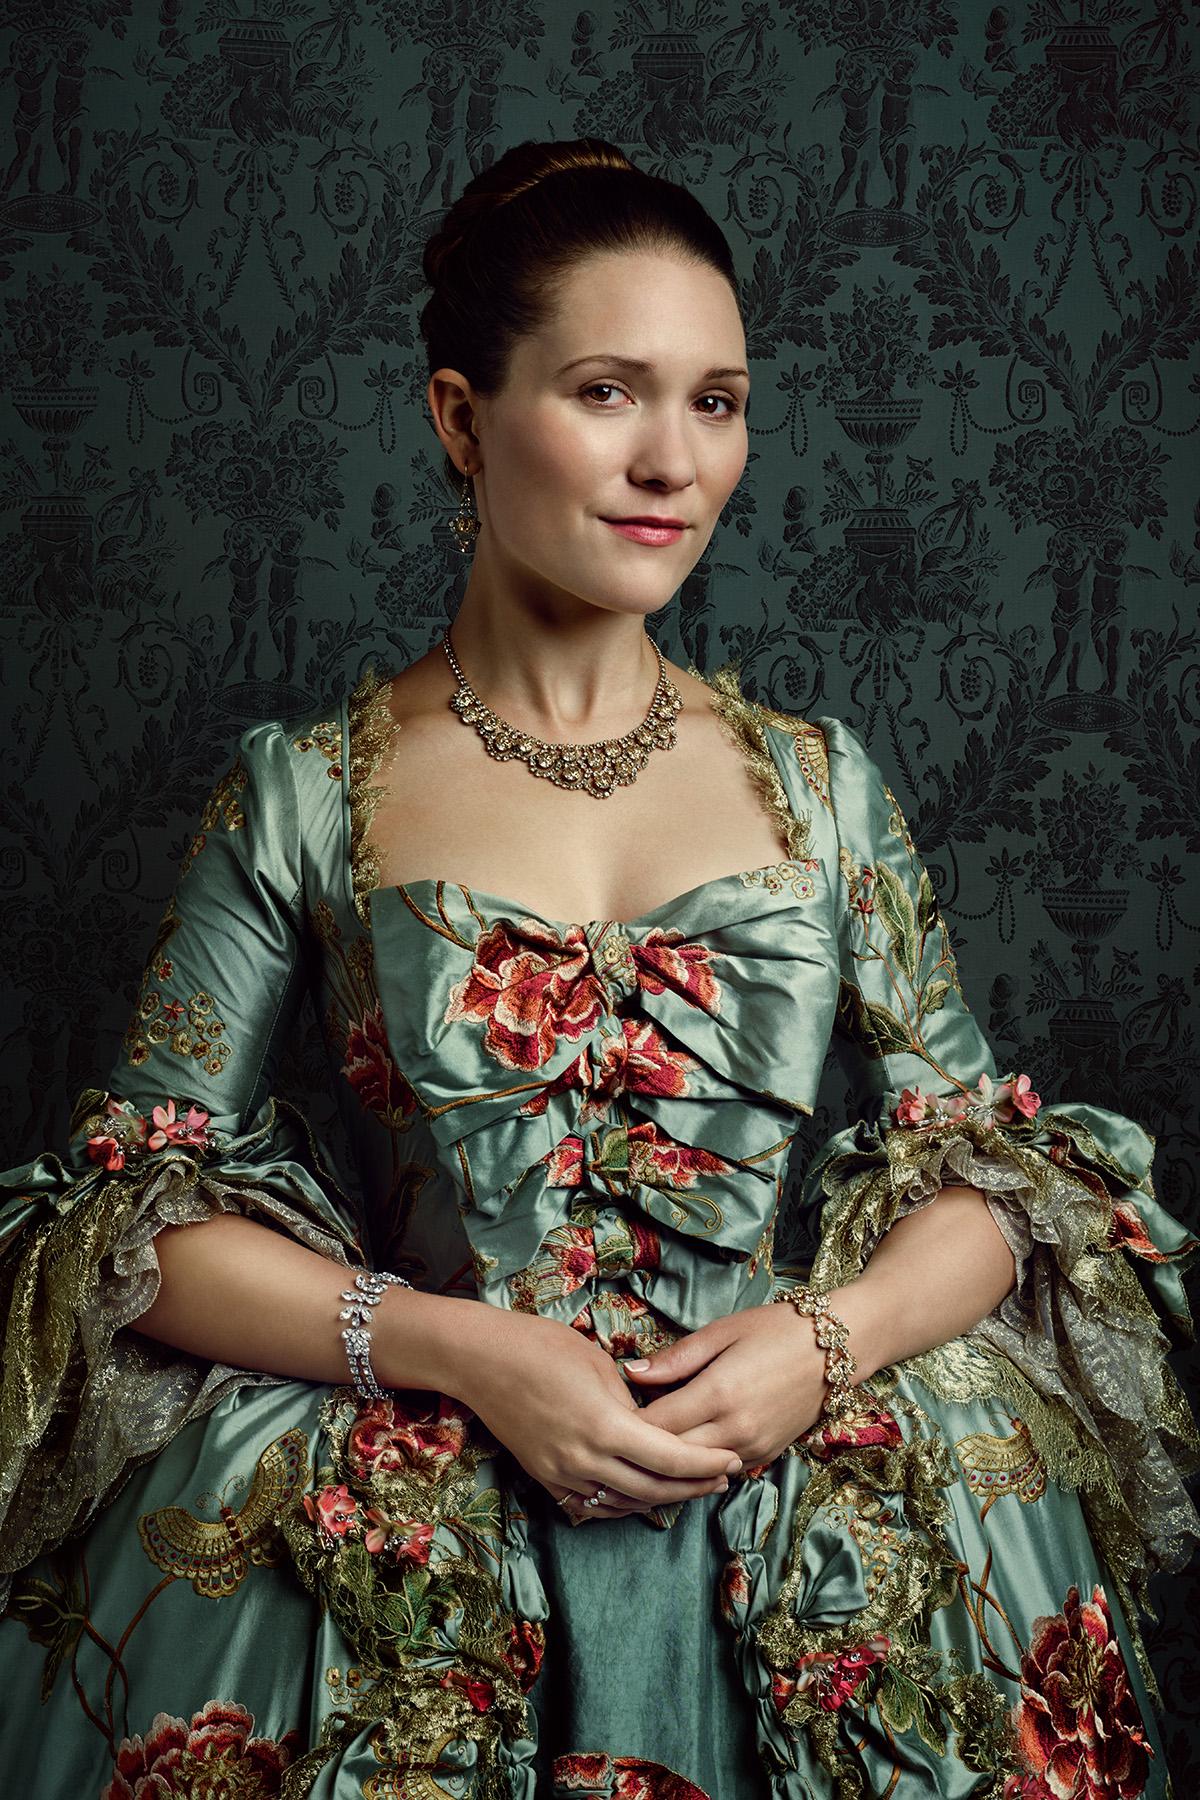 Bildergebnis für Marie Louise Henriette Jeanne de La Tour d'Auvergne